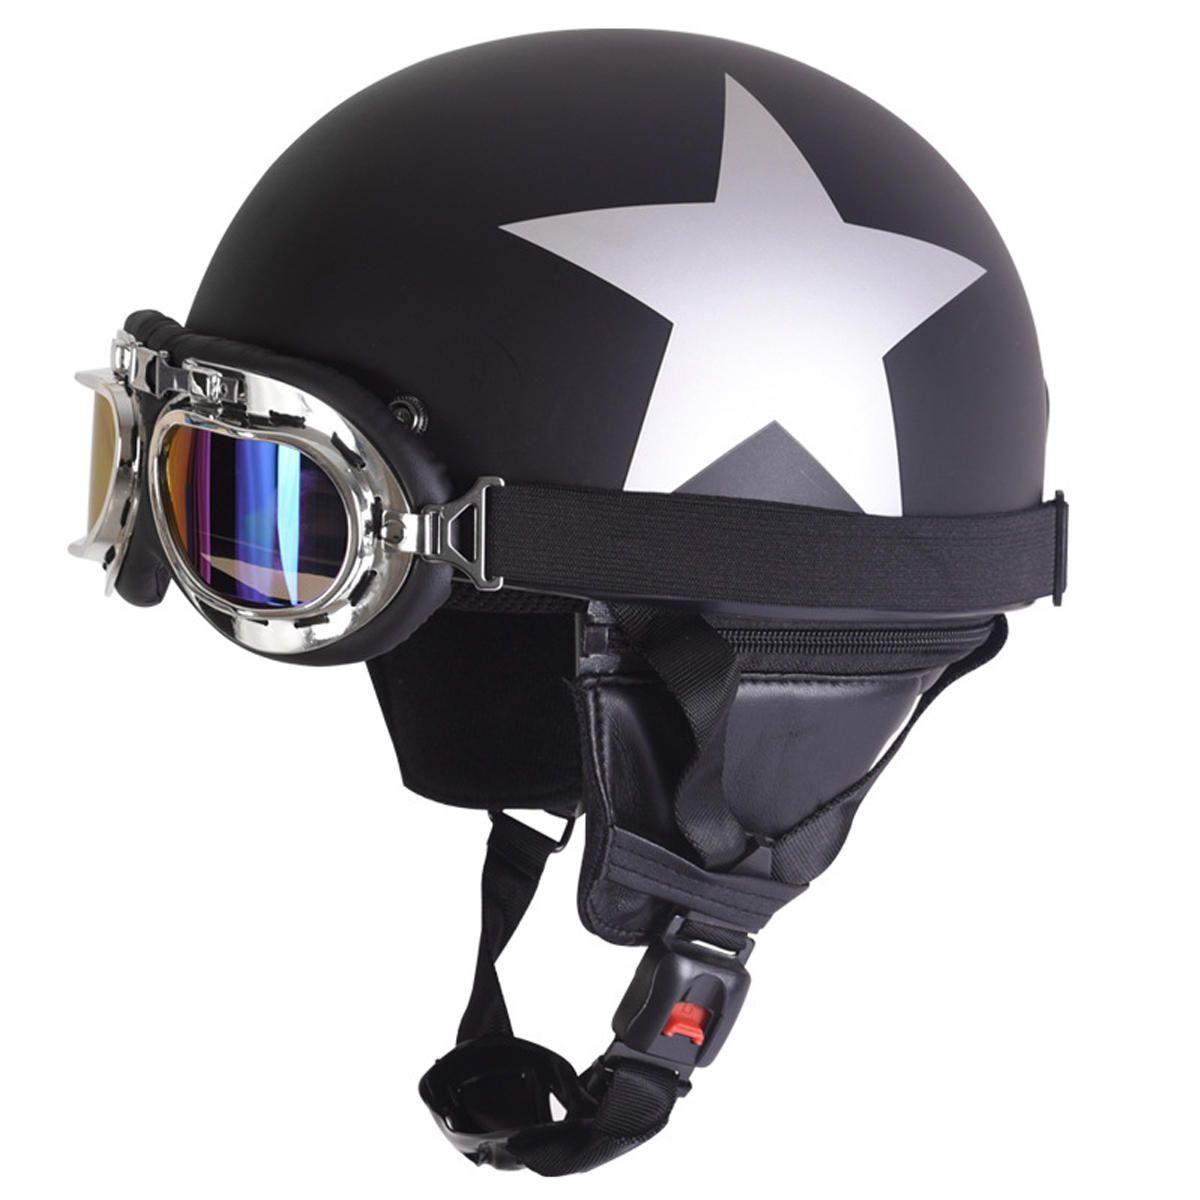 Retro Vintage Motorcycle Helmet Safety Half Helmet with Sun Visor UV Goggles